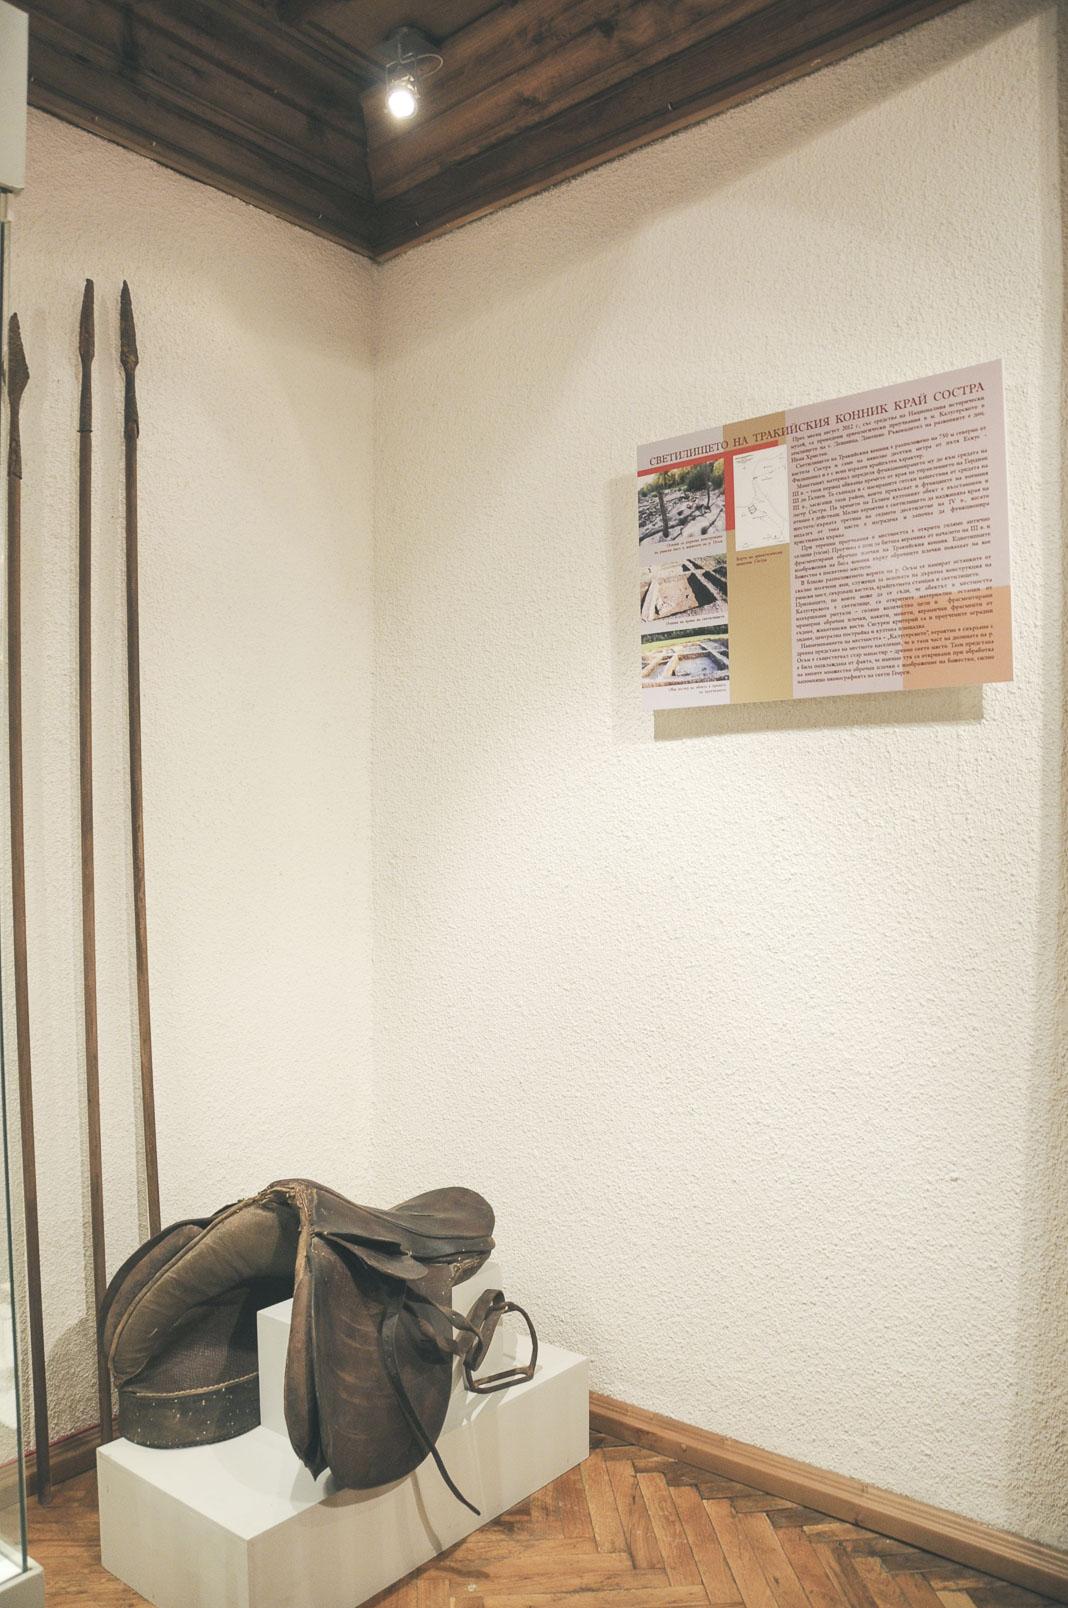 troyan-museum-jivotat-na-edna-idea-14